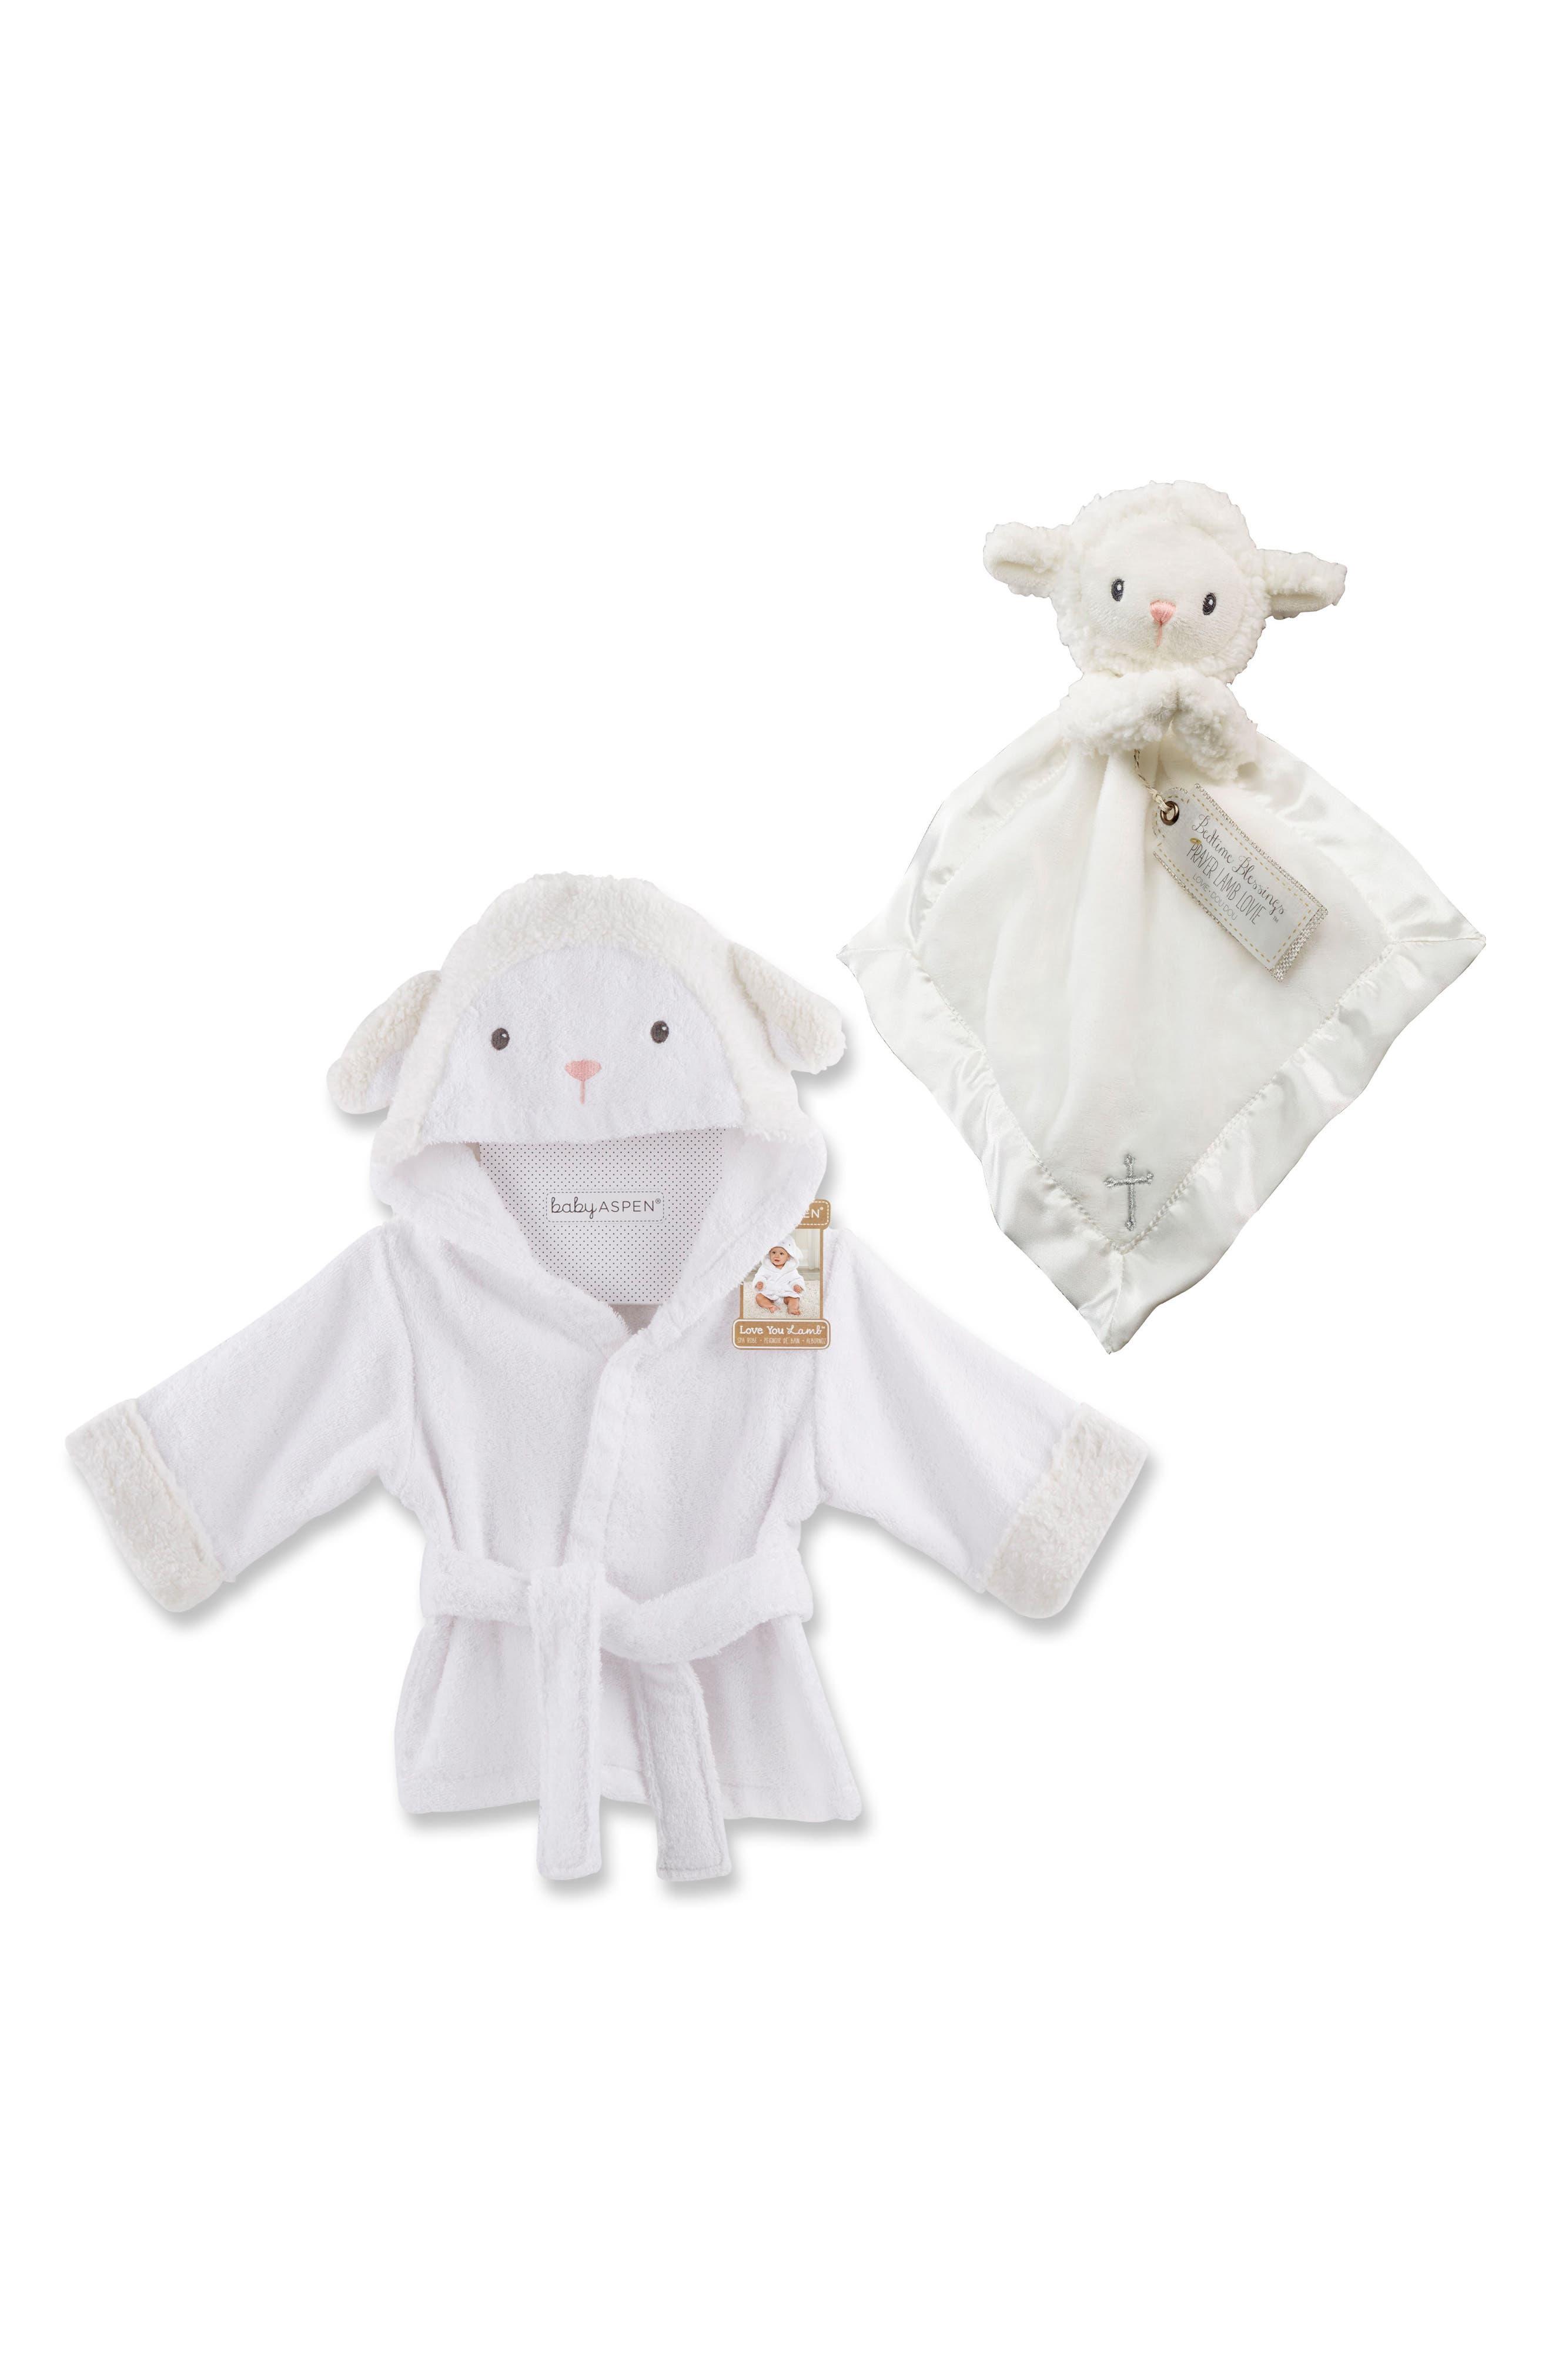 Alternate Image 1 Selected - Baby Aspen Lamb Hooded Robe & Blanket (Baby)